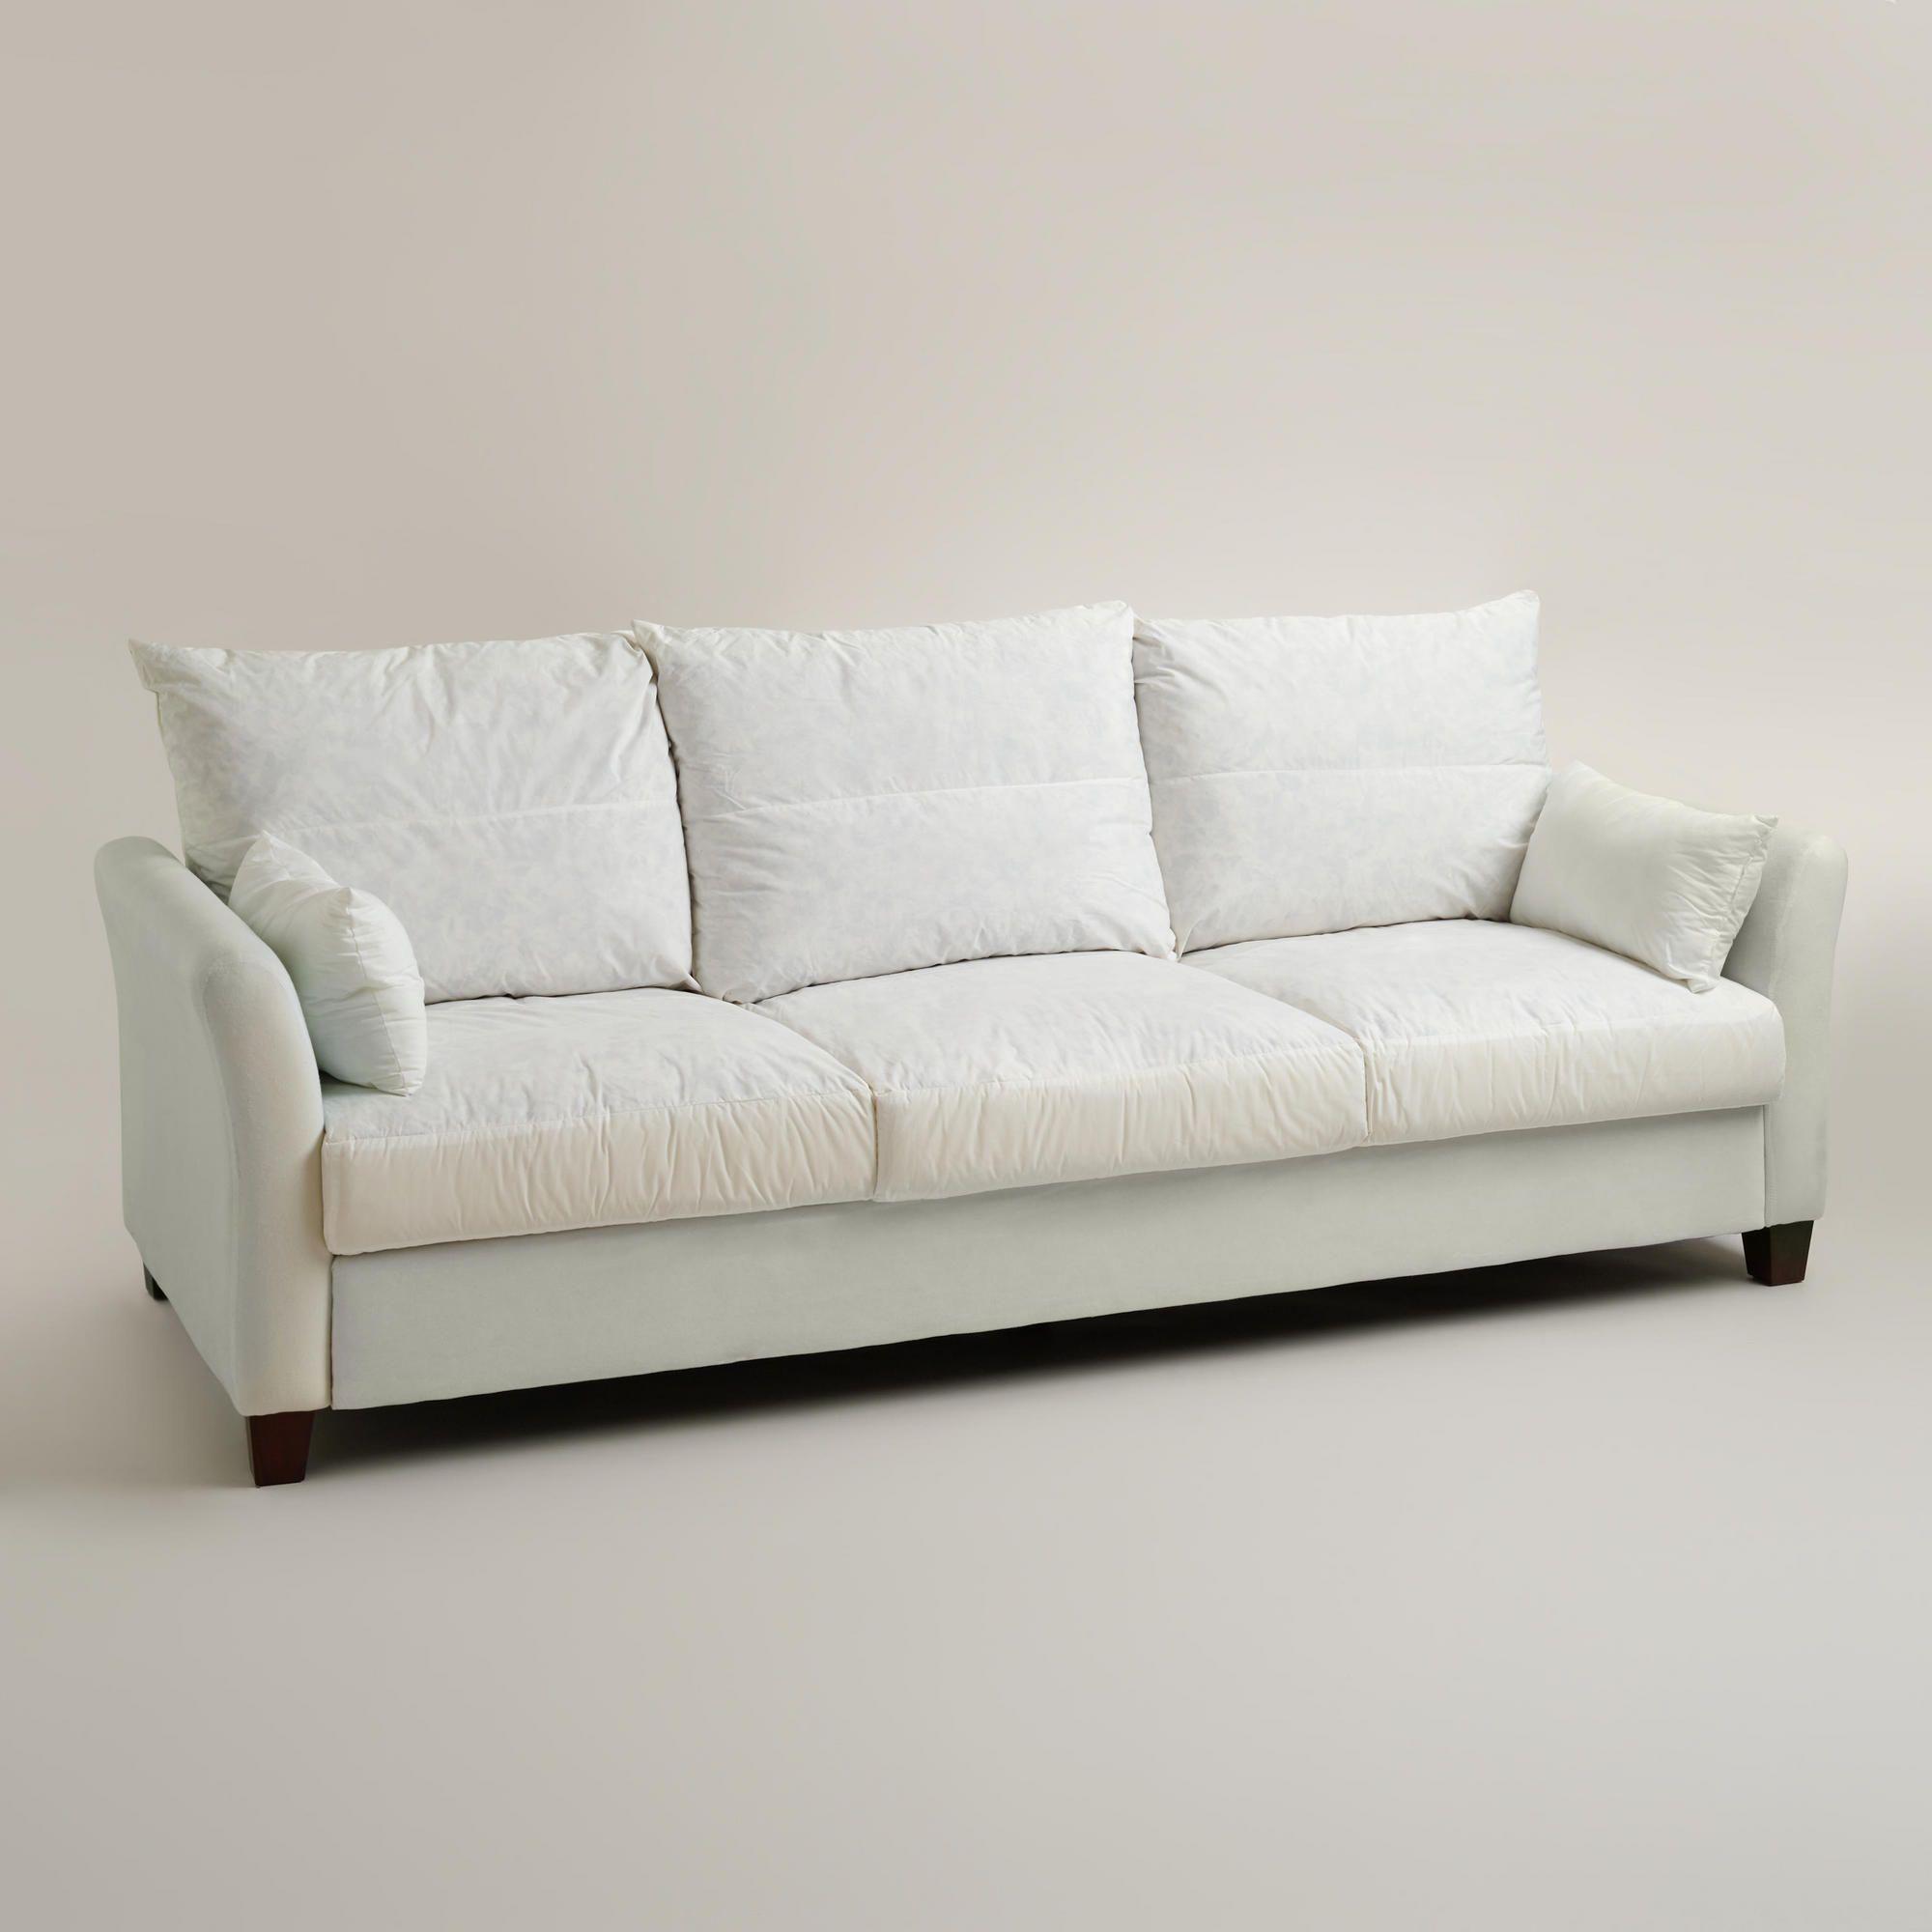 Luxe Three Seat Sofa Frame World Market House Stuff